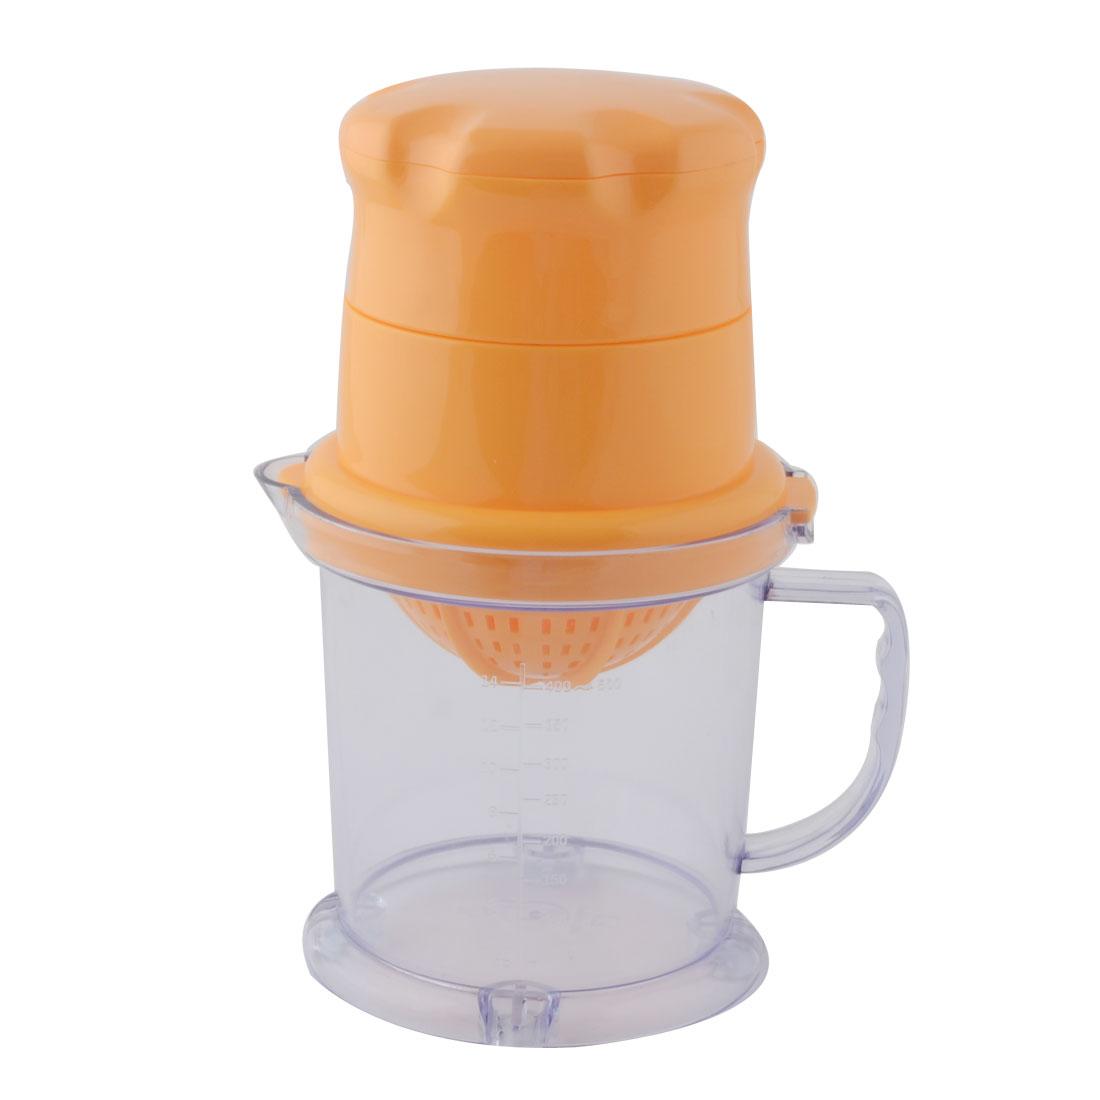 Kitchen Plastic Citrus Orange Lemon Fruit Manual Juicer Extractor Squeezer 450ml